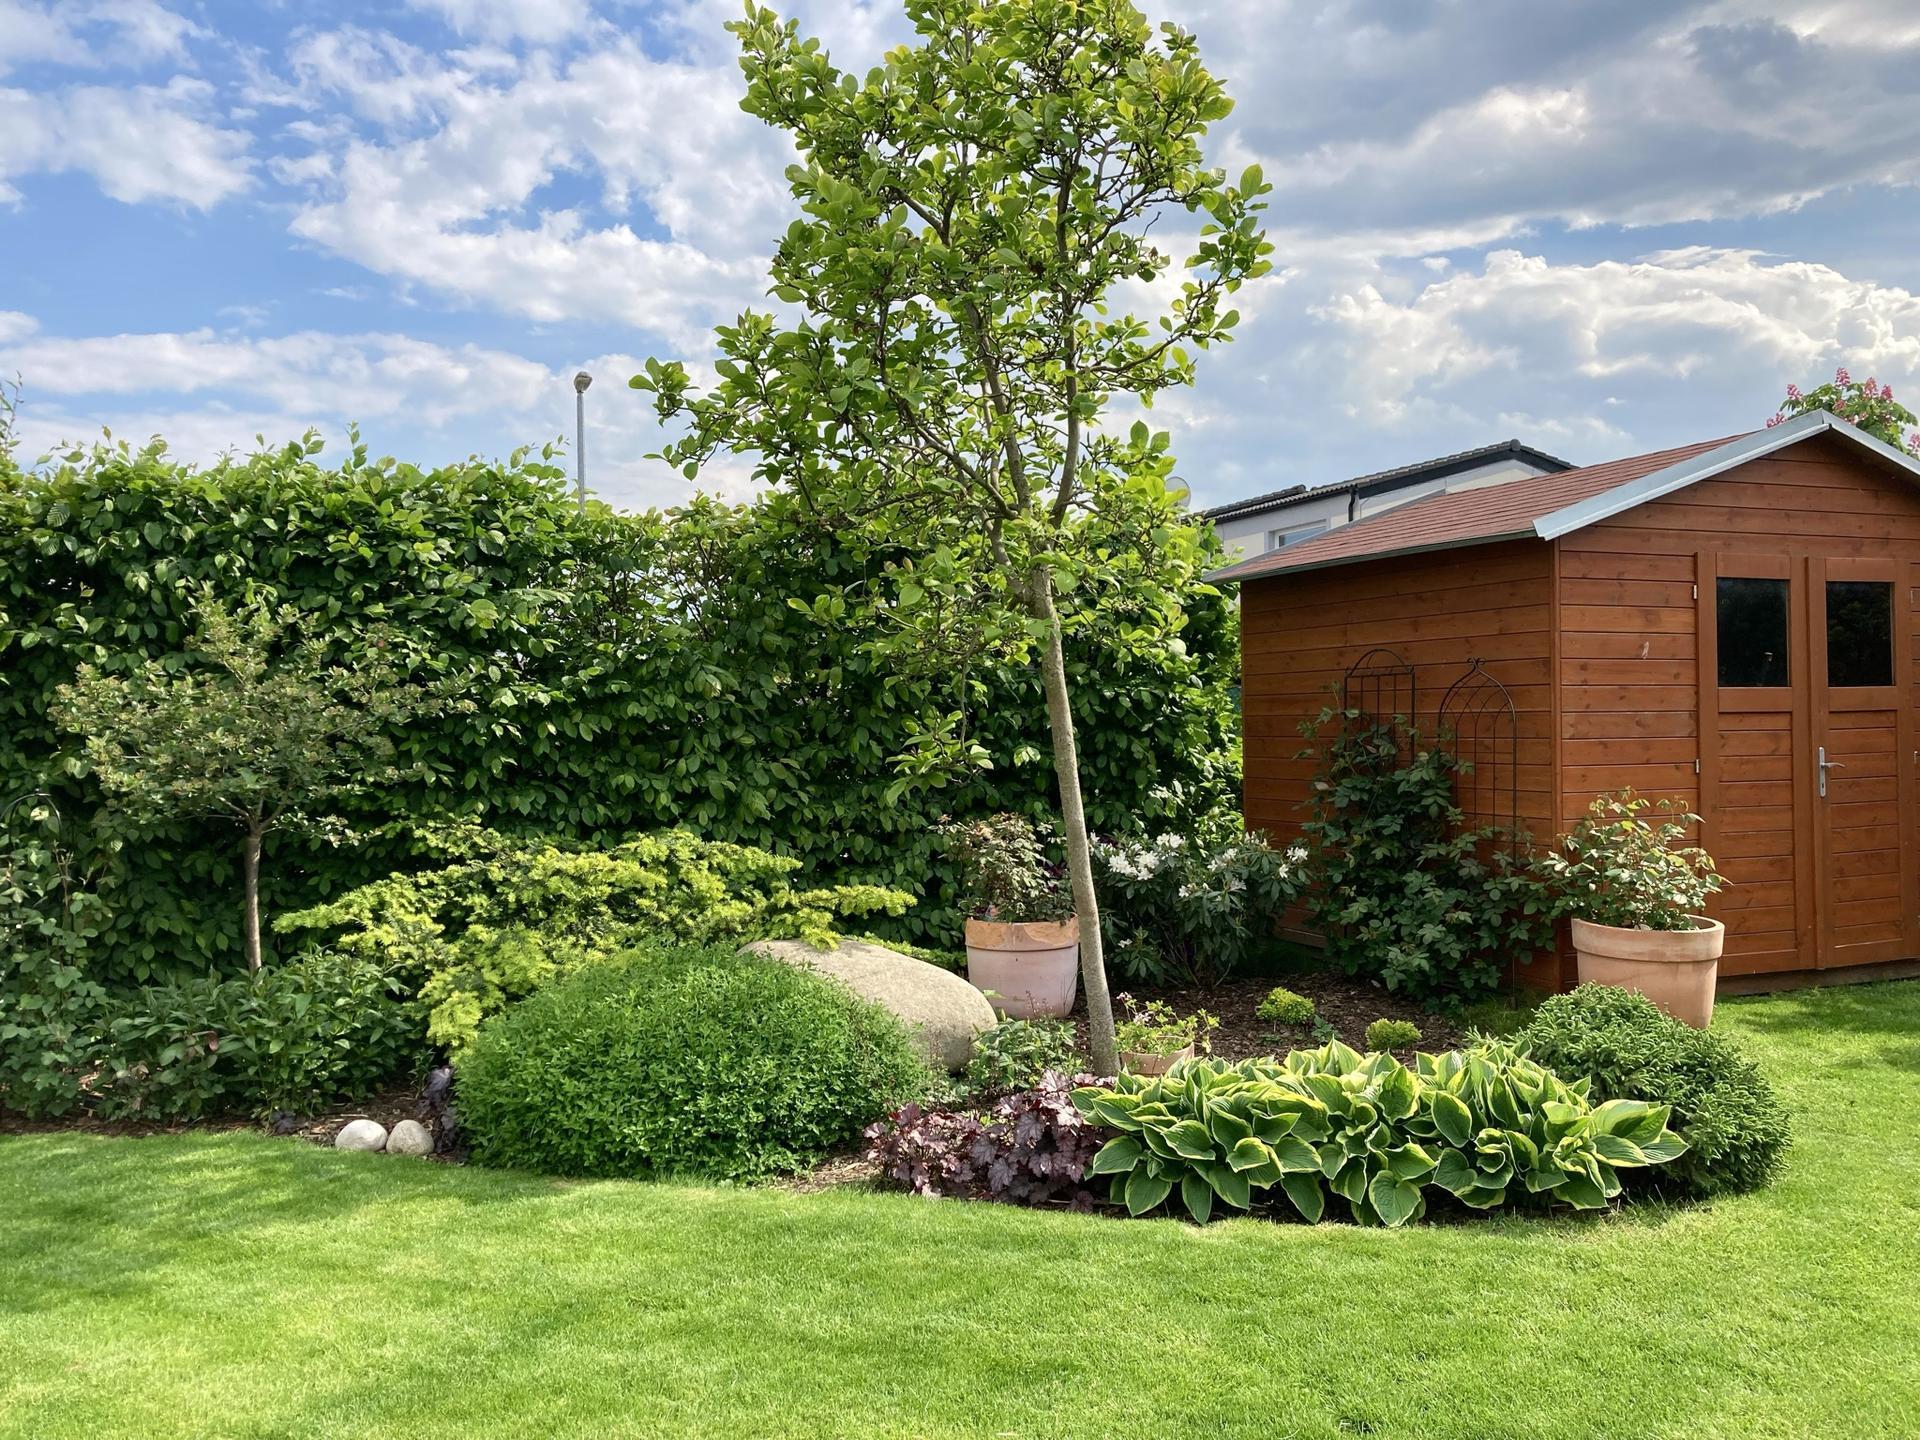 Zahrada 2021 - Magnolie konecne bez podper- po 6 letech! Je nahnuta vlivem vetru, tak snad nam ji prvni vichr nevyvrati....